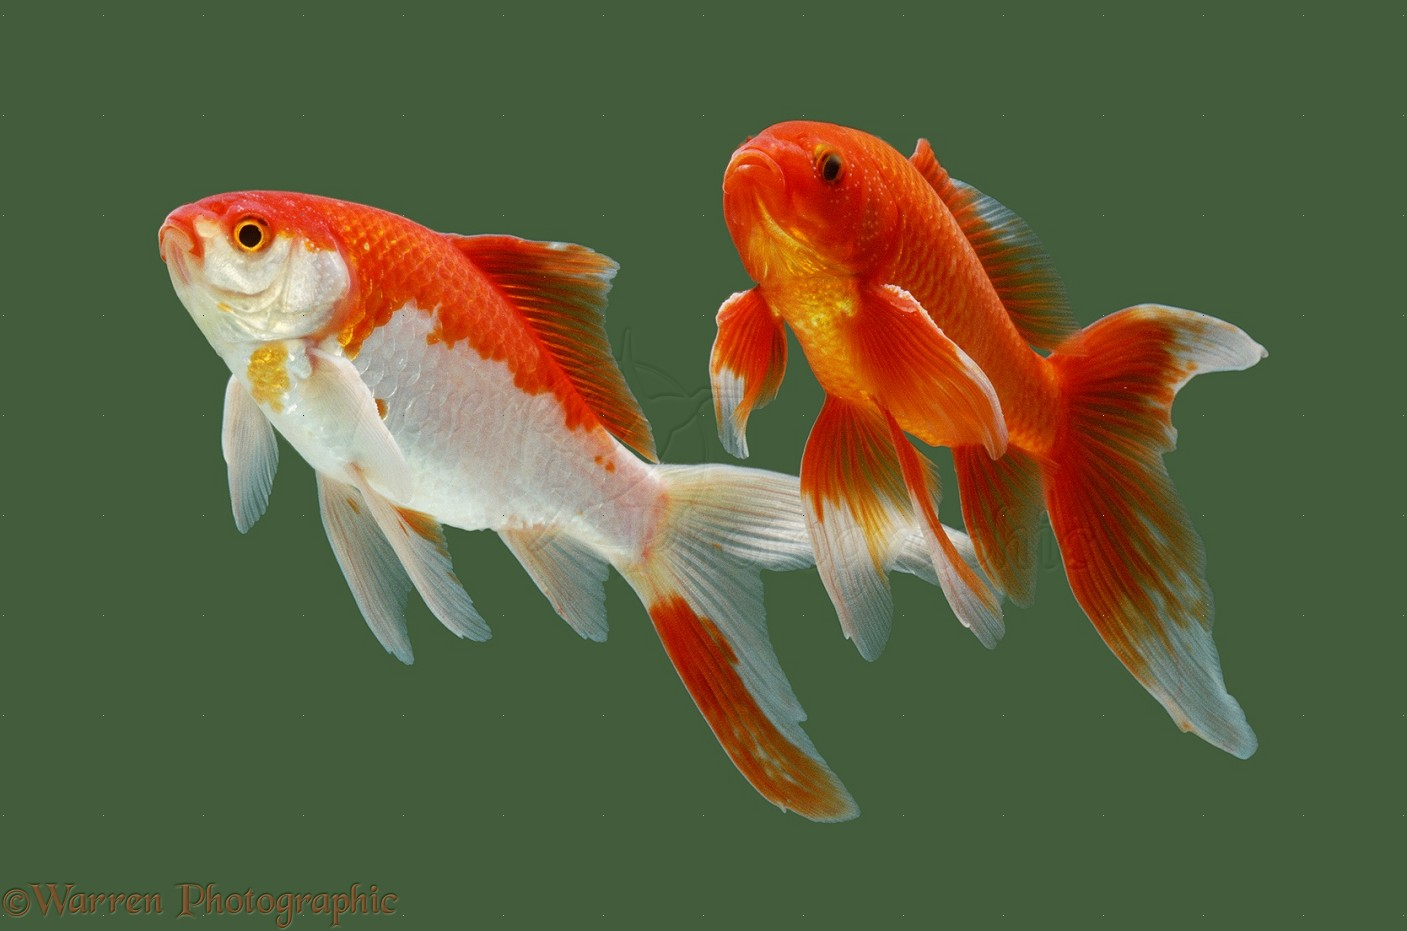 HQ Goldfish Wallpapers   File 144.24Kb